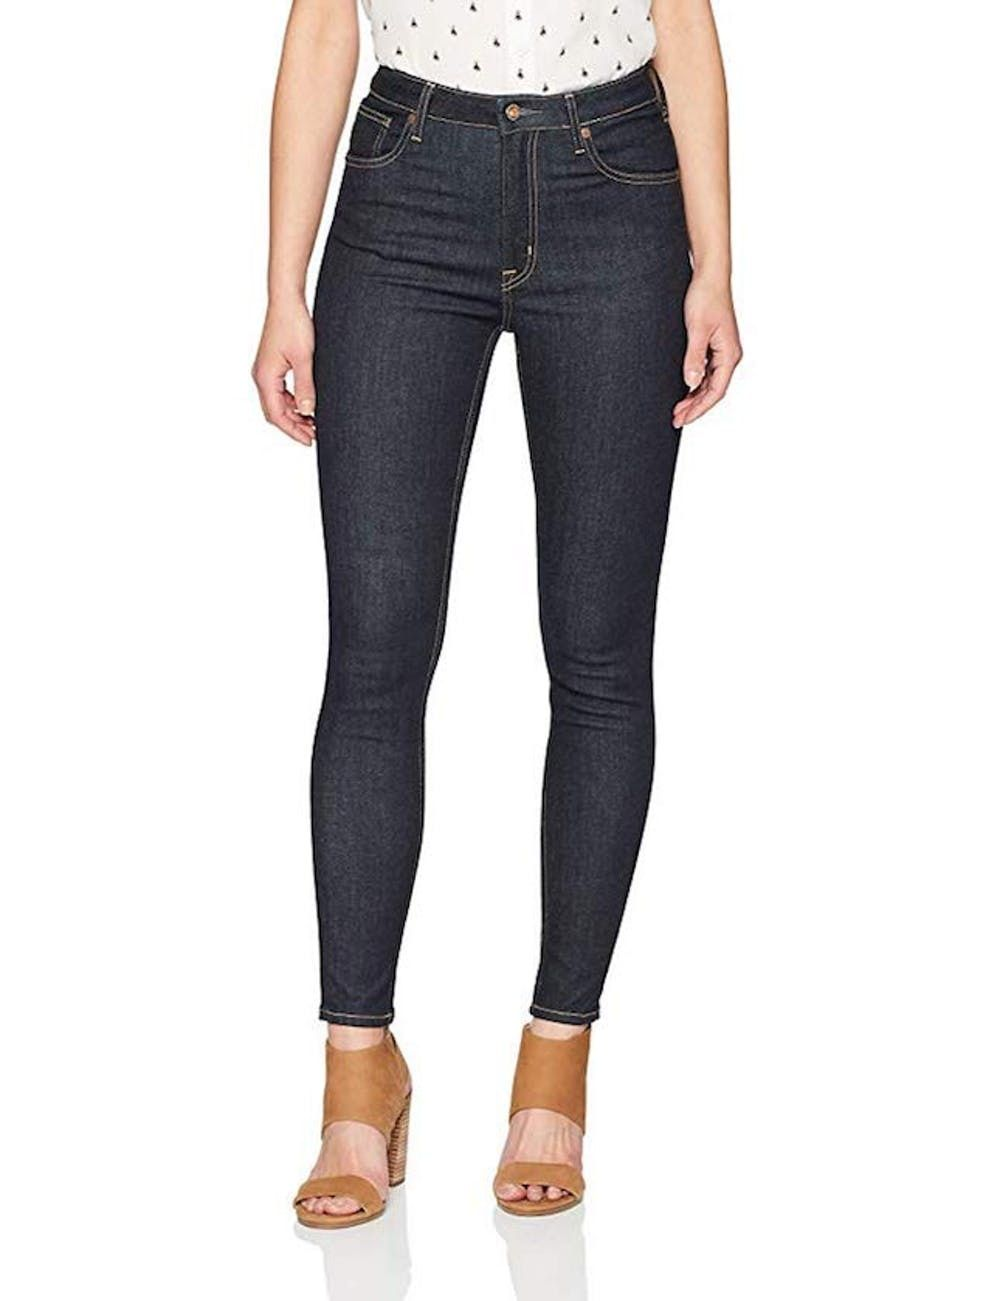 Denim Bloom Womens Low Rise Super Skinny Power Stretch Jeans